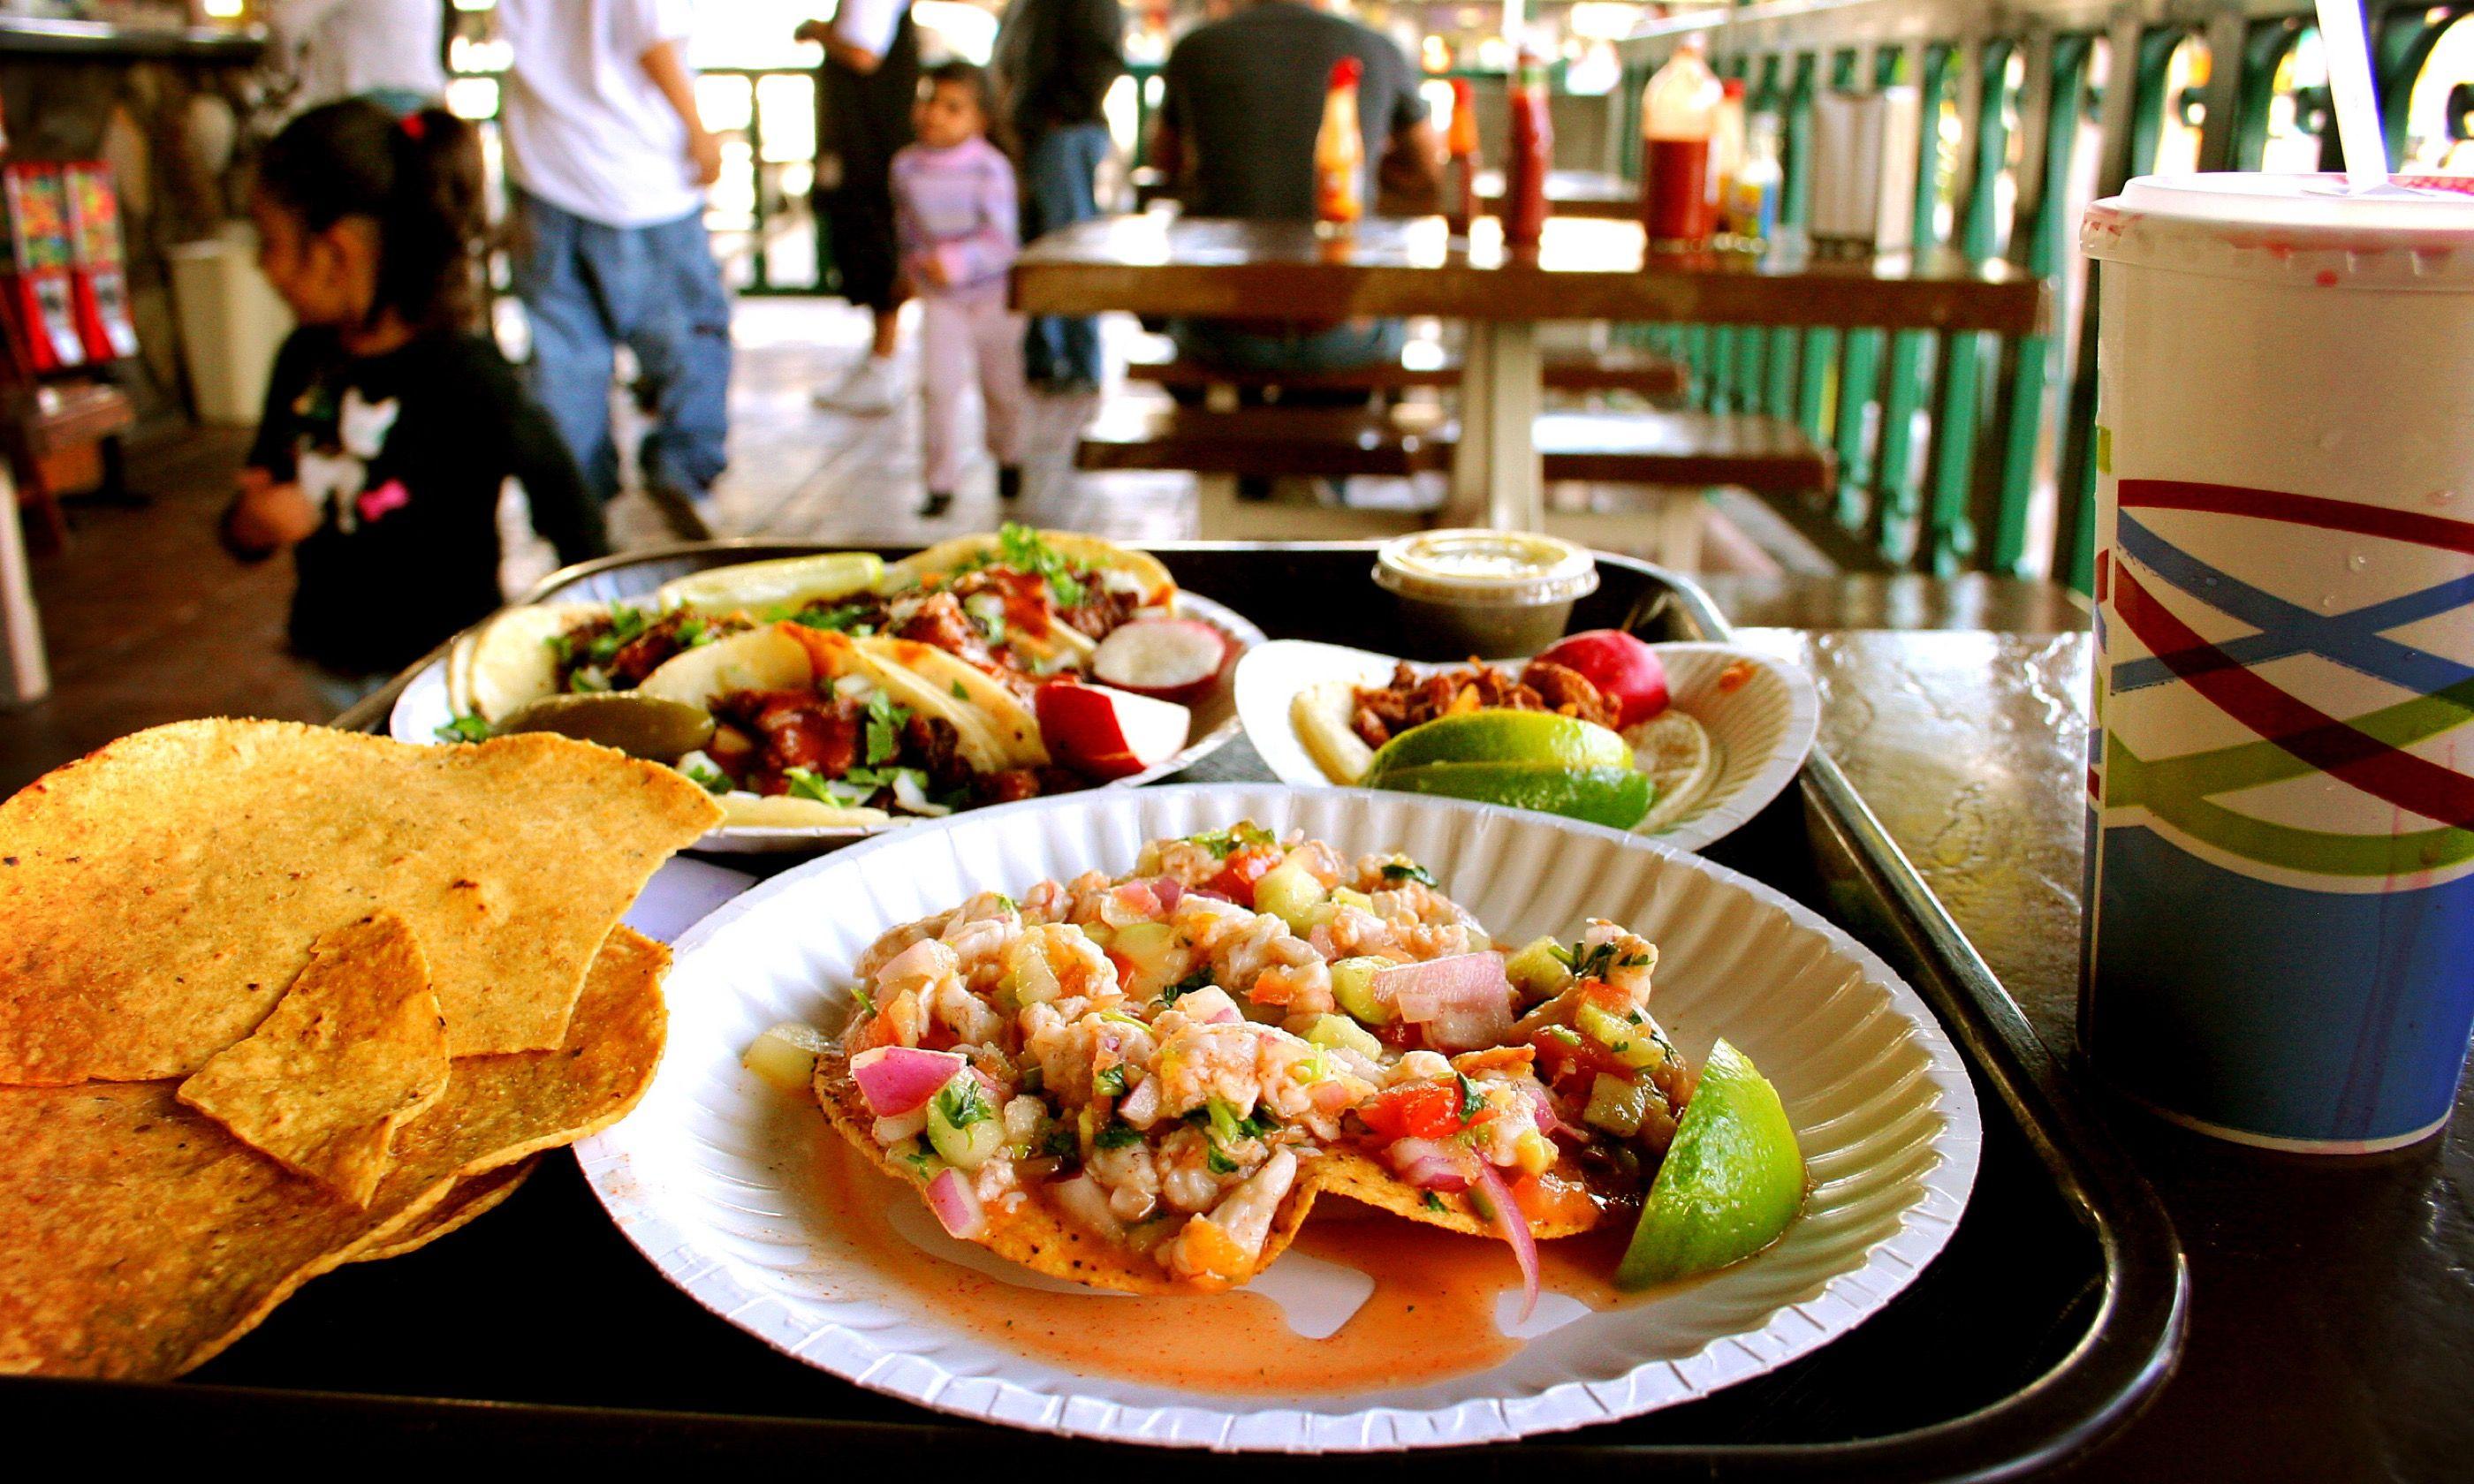 Food truck tacos (Gwen Harlow/VisitOakland.com)